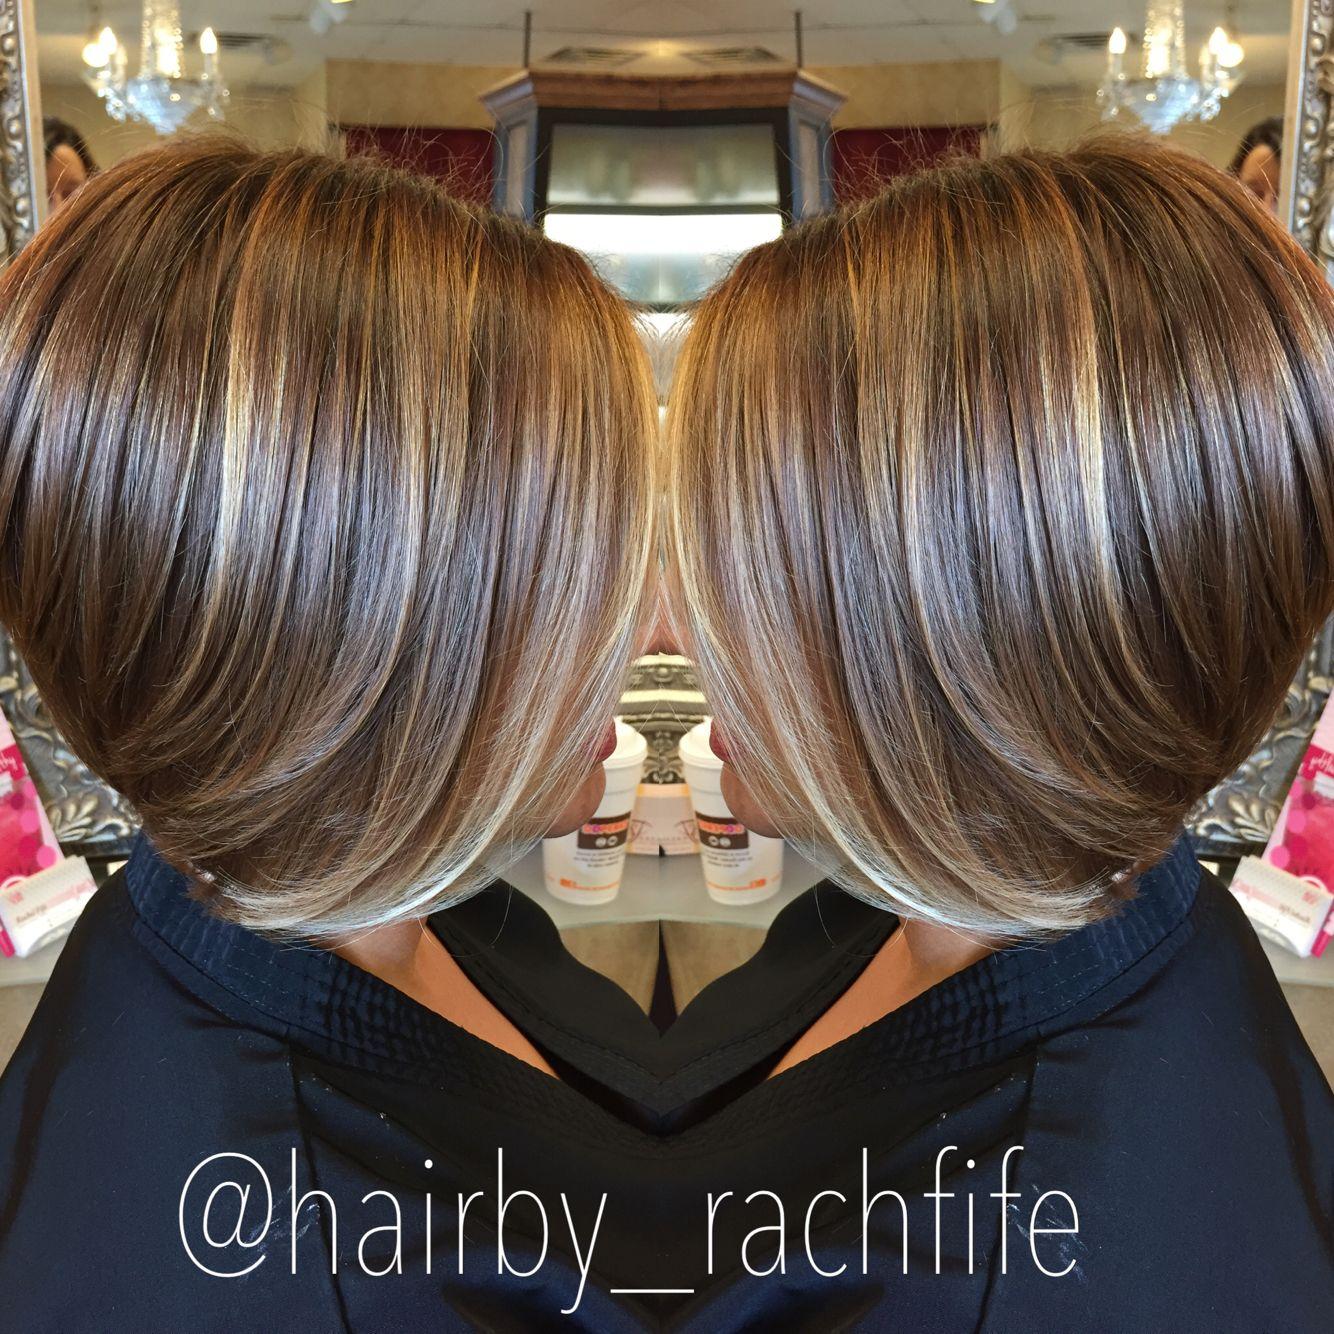 short bob haircut with subtle balayage highlights. hair by